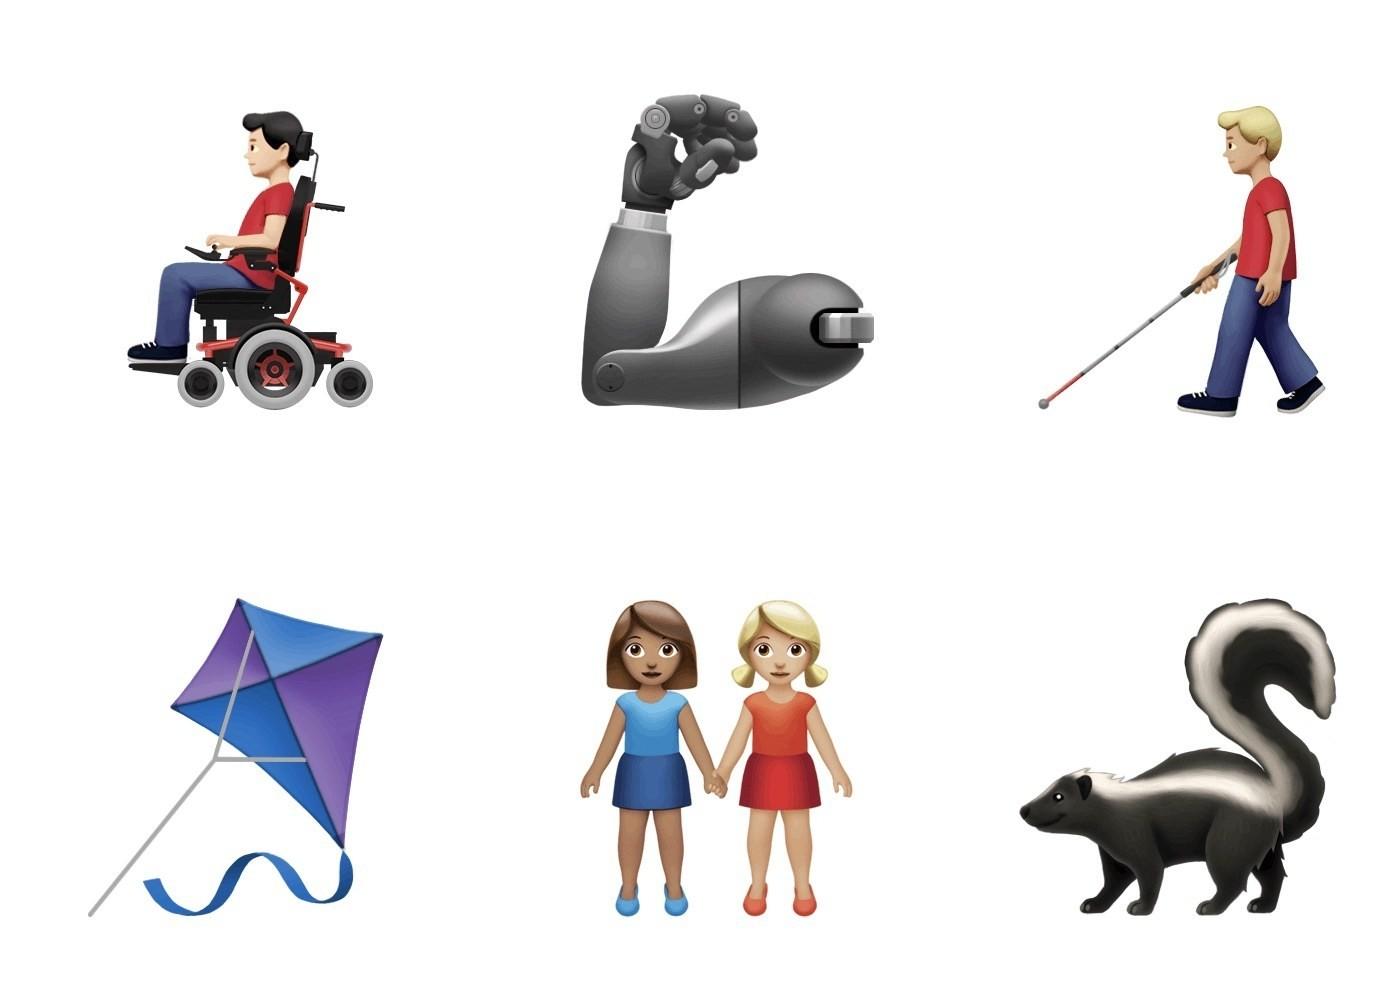 Emoji, Emojipedia, World Emoji Day, Unicode Consortium, iOS, Emoticon, , iOS 13, iPhone, Android Q, nieuwe emojis 2019, Cartoon, Clip art, Figurine, Animation, Illustration, Fictional character, Animal figure, Graphics, Art